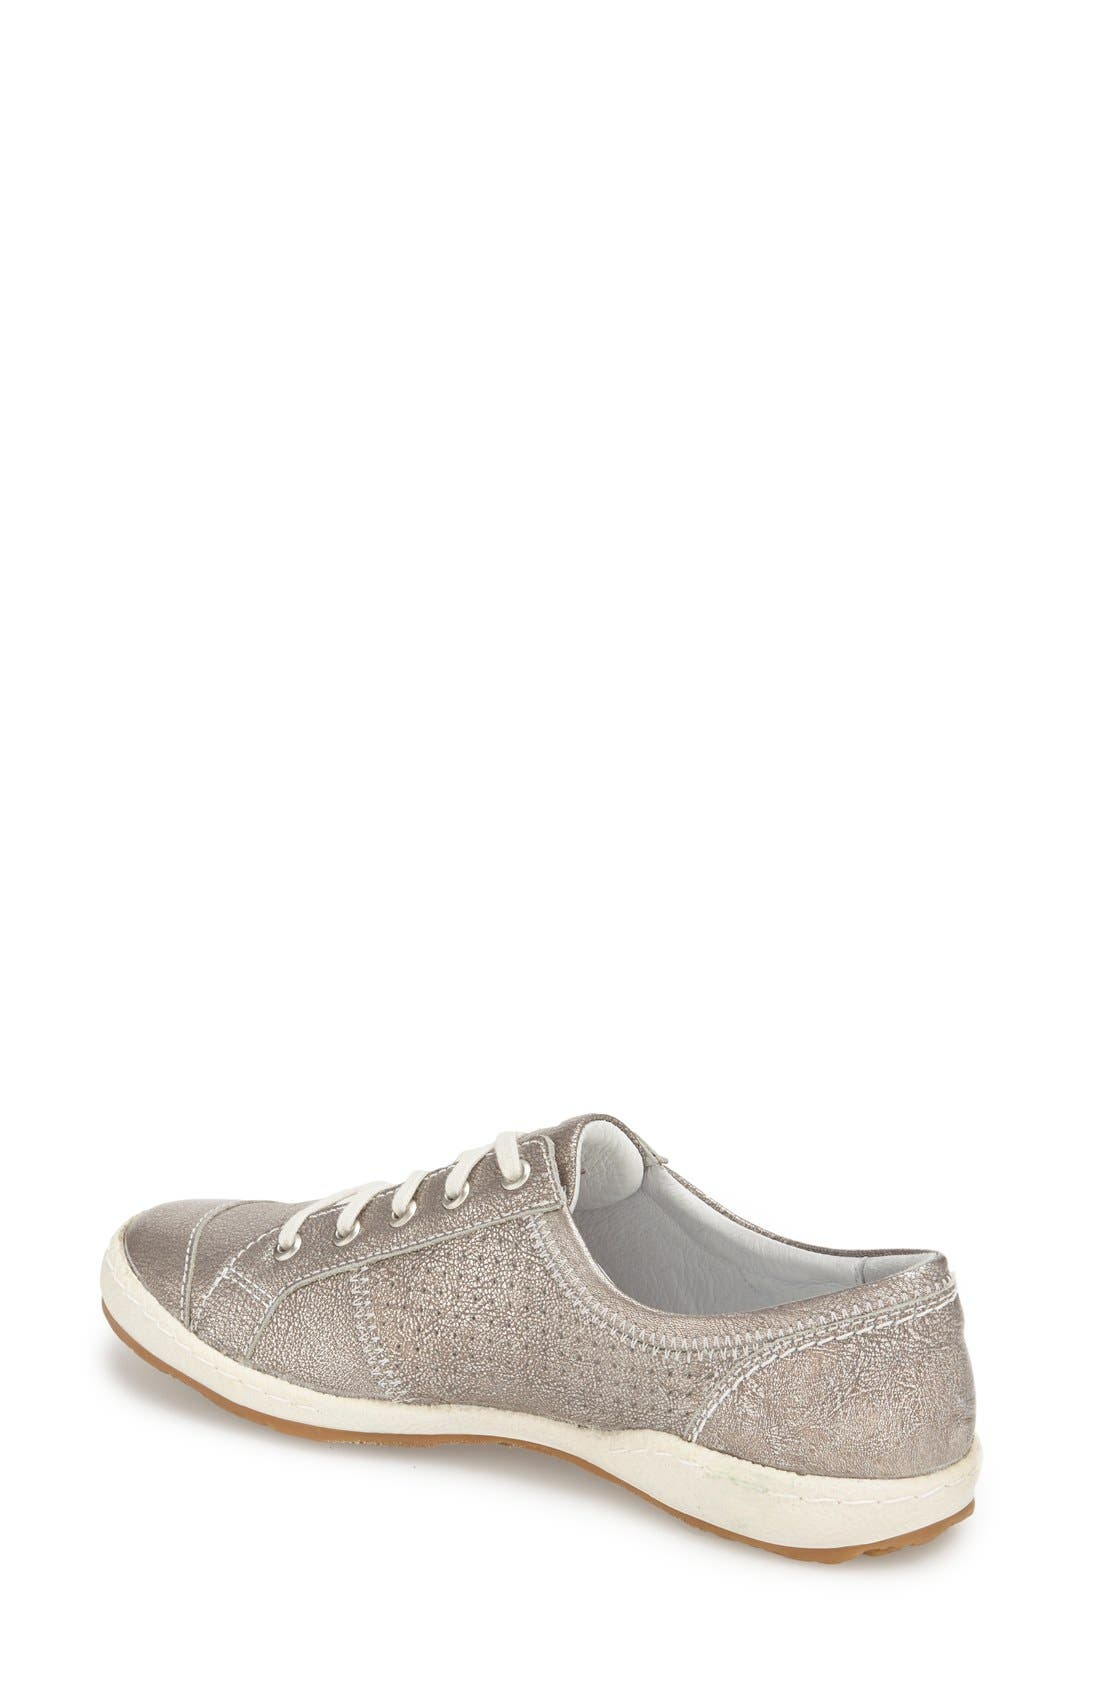 Alternate Image 2  - Josef Seibel 'Caspian' Sneaker